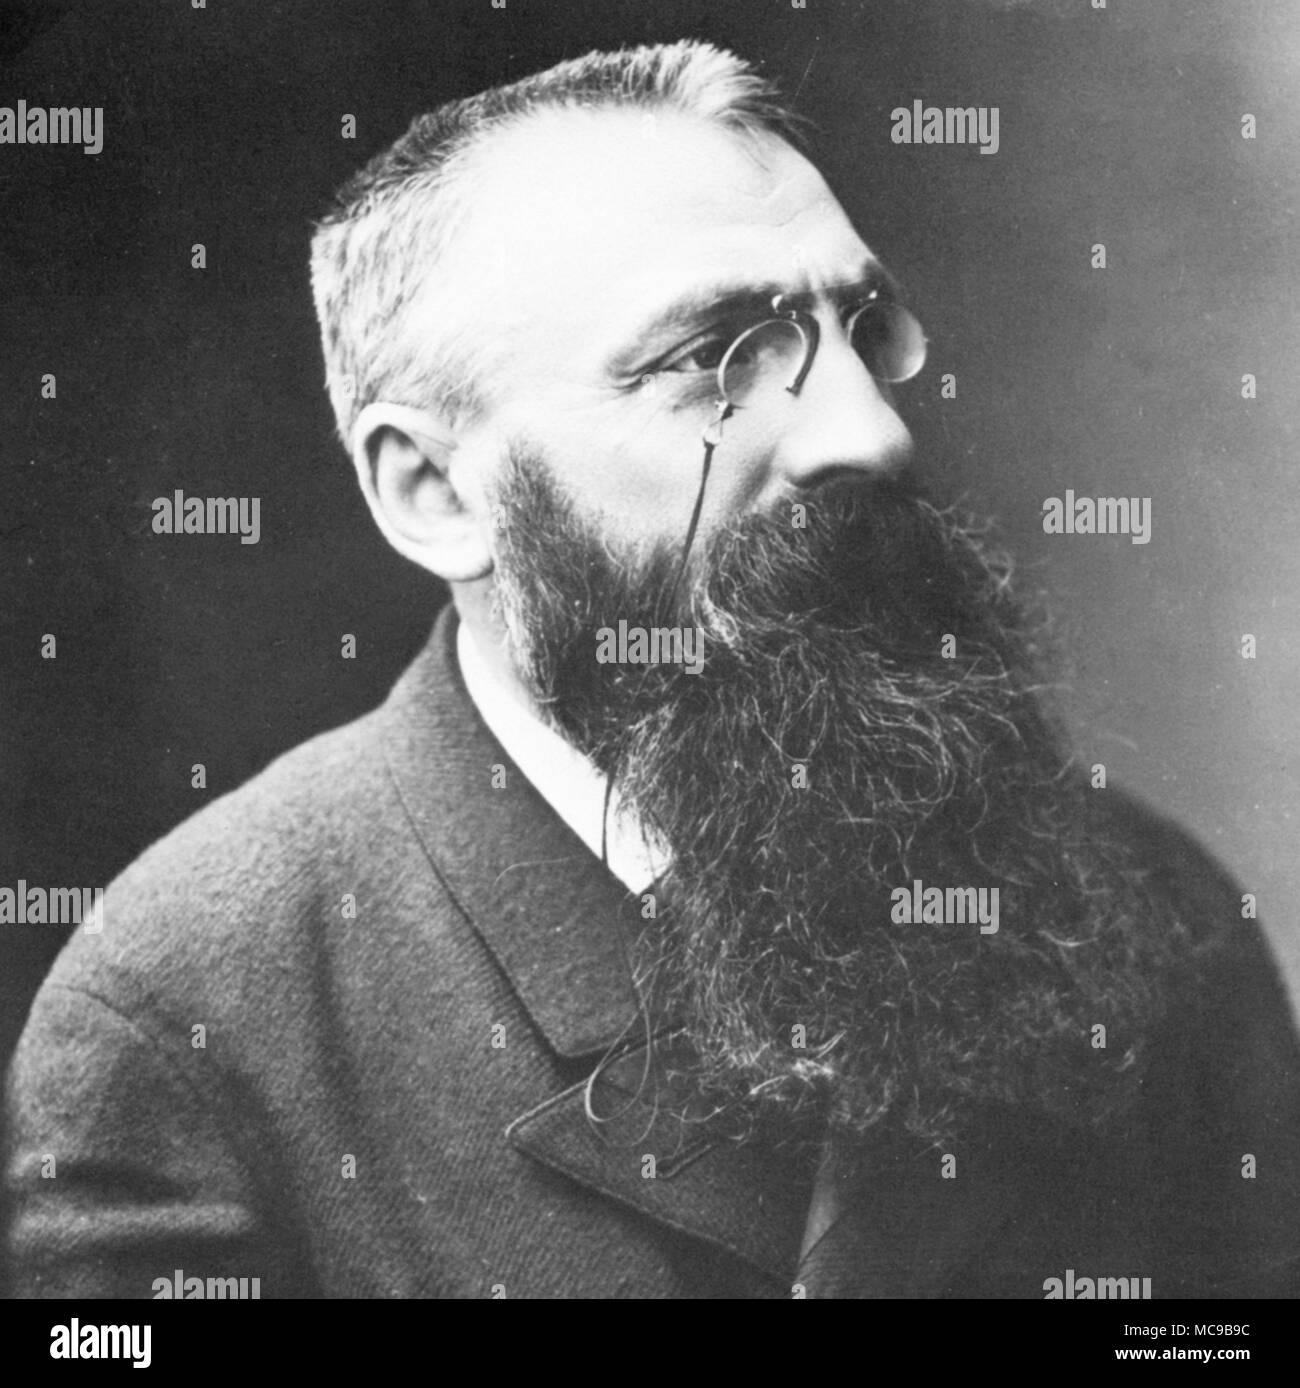 François Auguste René Rodin (1840 – 1917), Auguste Rodin, French sculptor. Stock Photo